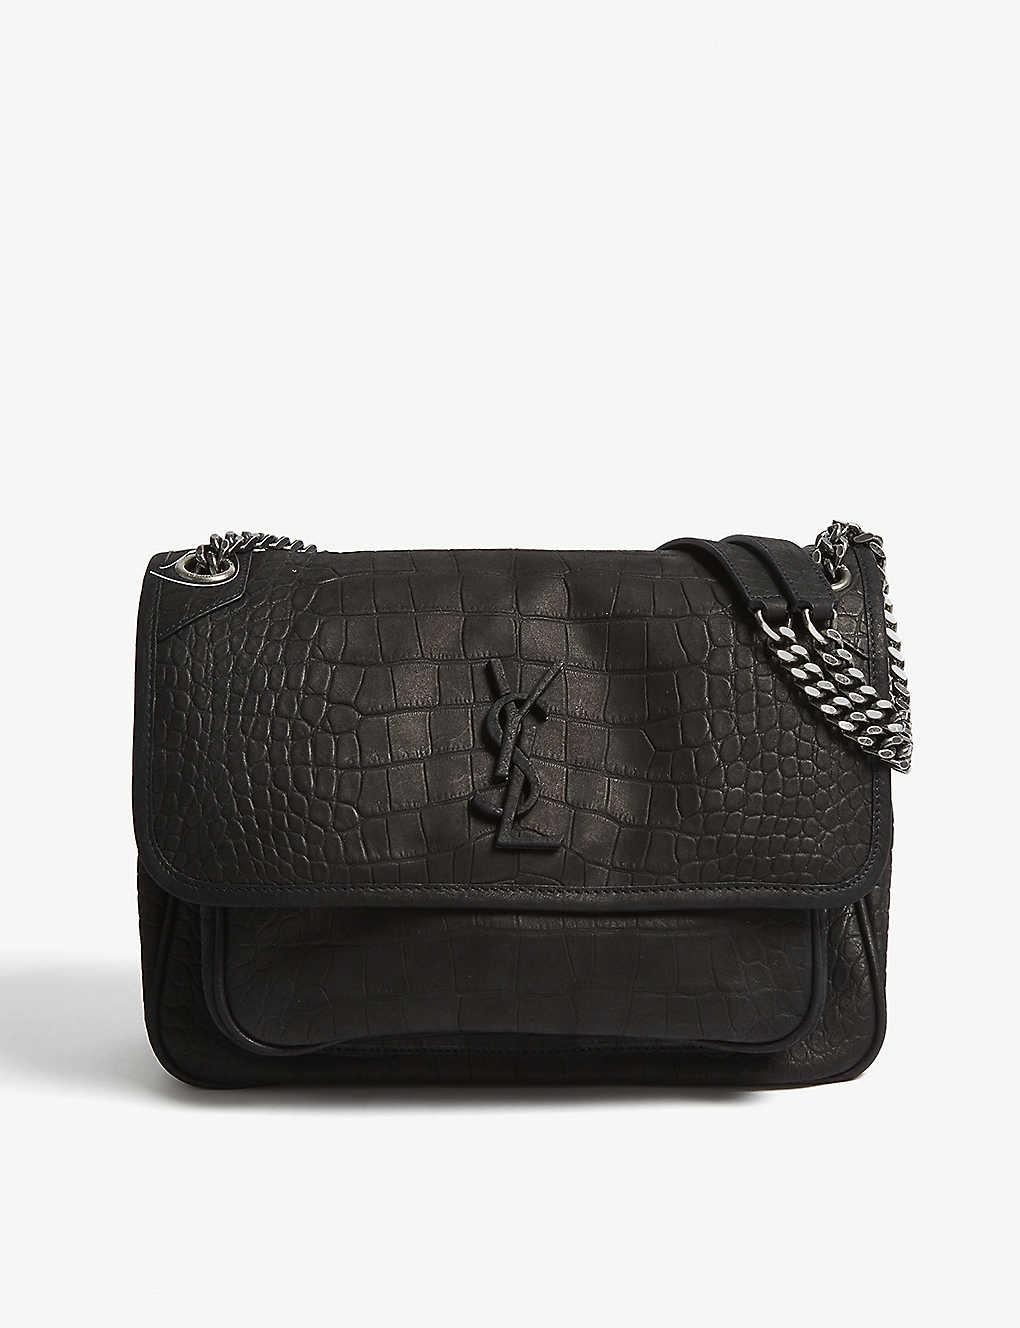 73d8e491b84 SAINT LAURENT - Monogram Niki medium matte leather shoulder bag ...